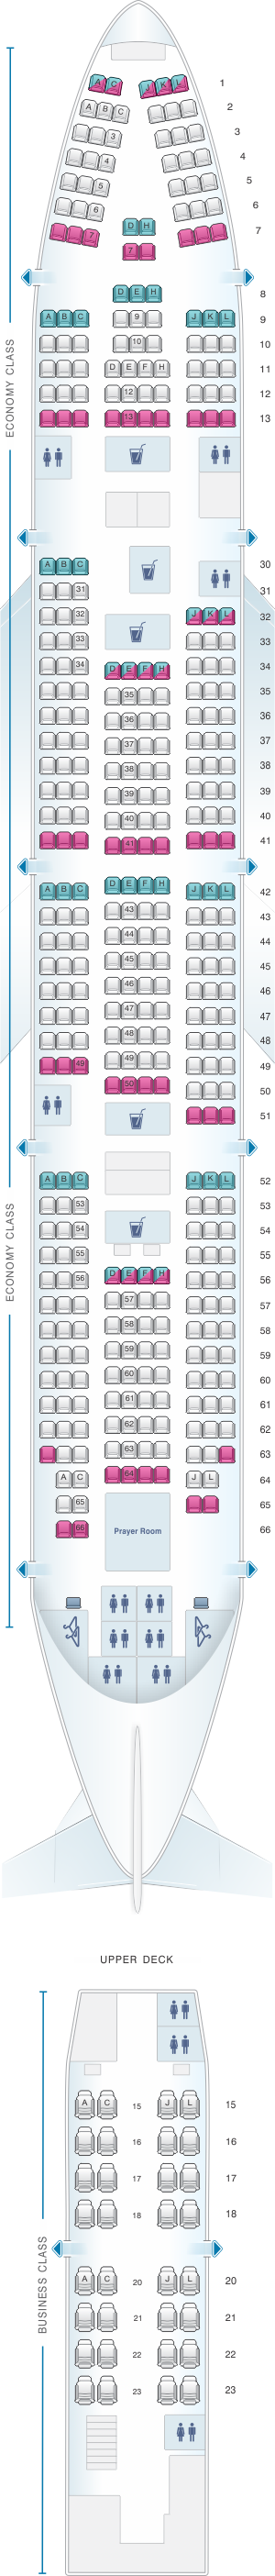 Seat map for Saudi Arabian Airlines Boeing B747 468